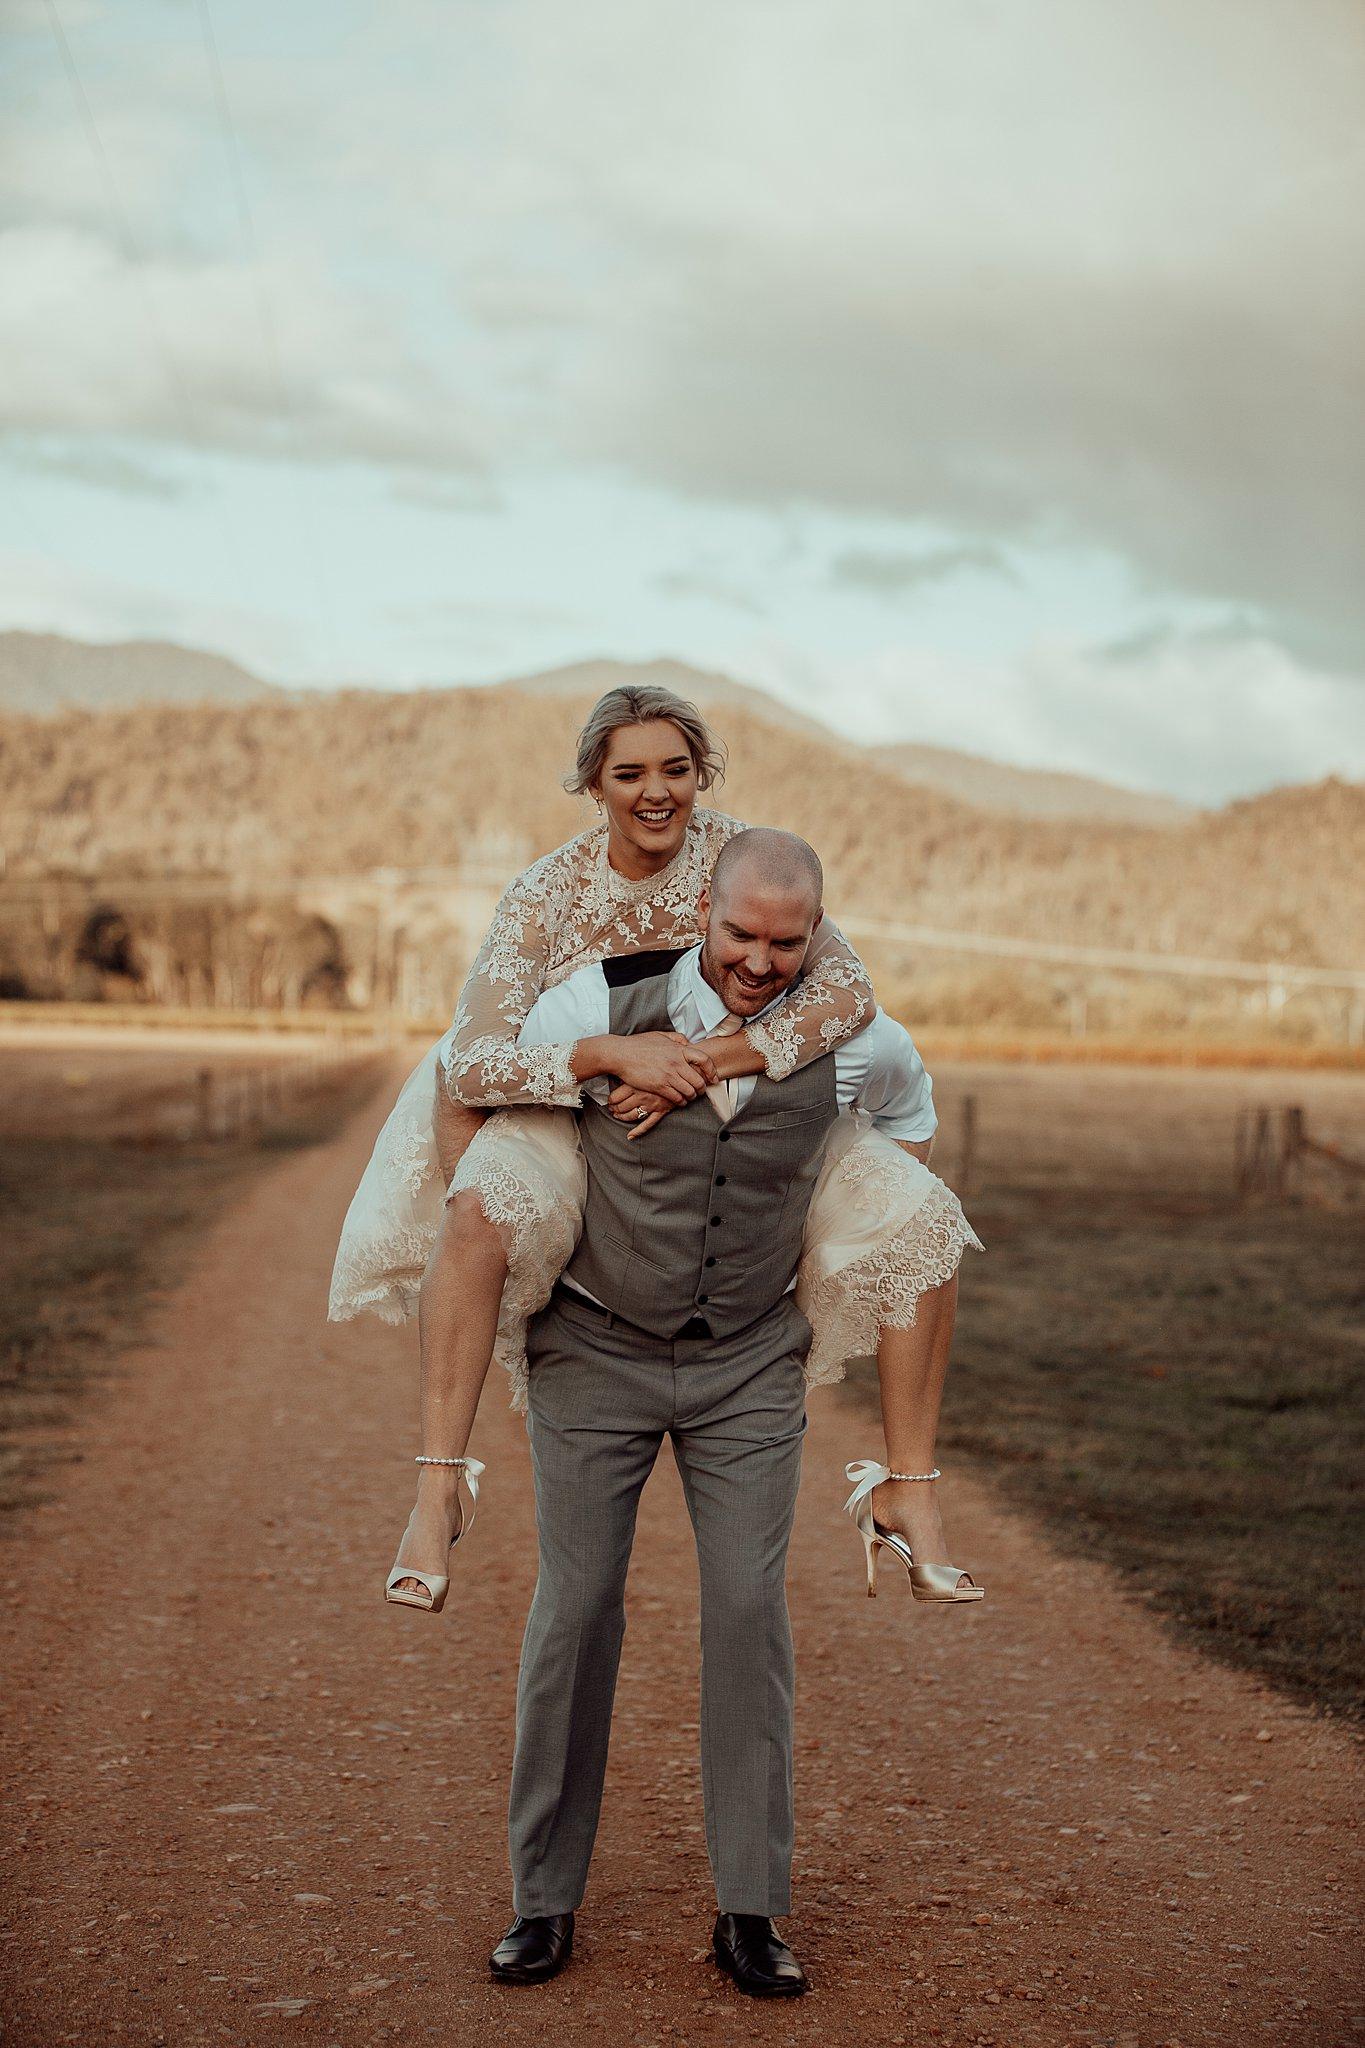 mickalathomas_puremacphotography_weddingphotographer_couplephotographer_Sheppartonphotographer_3472.jpg